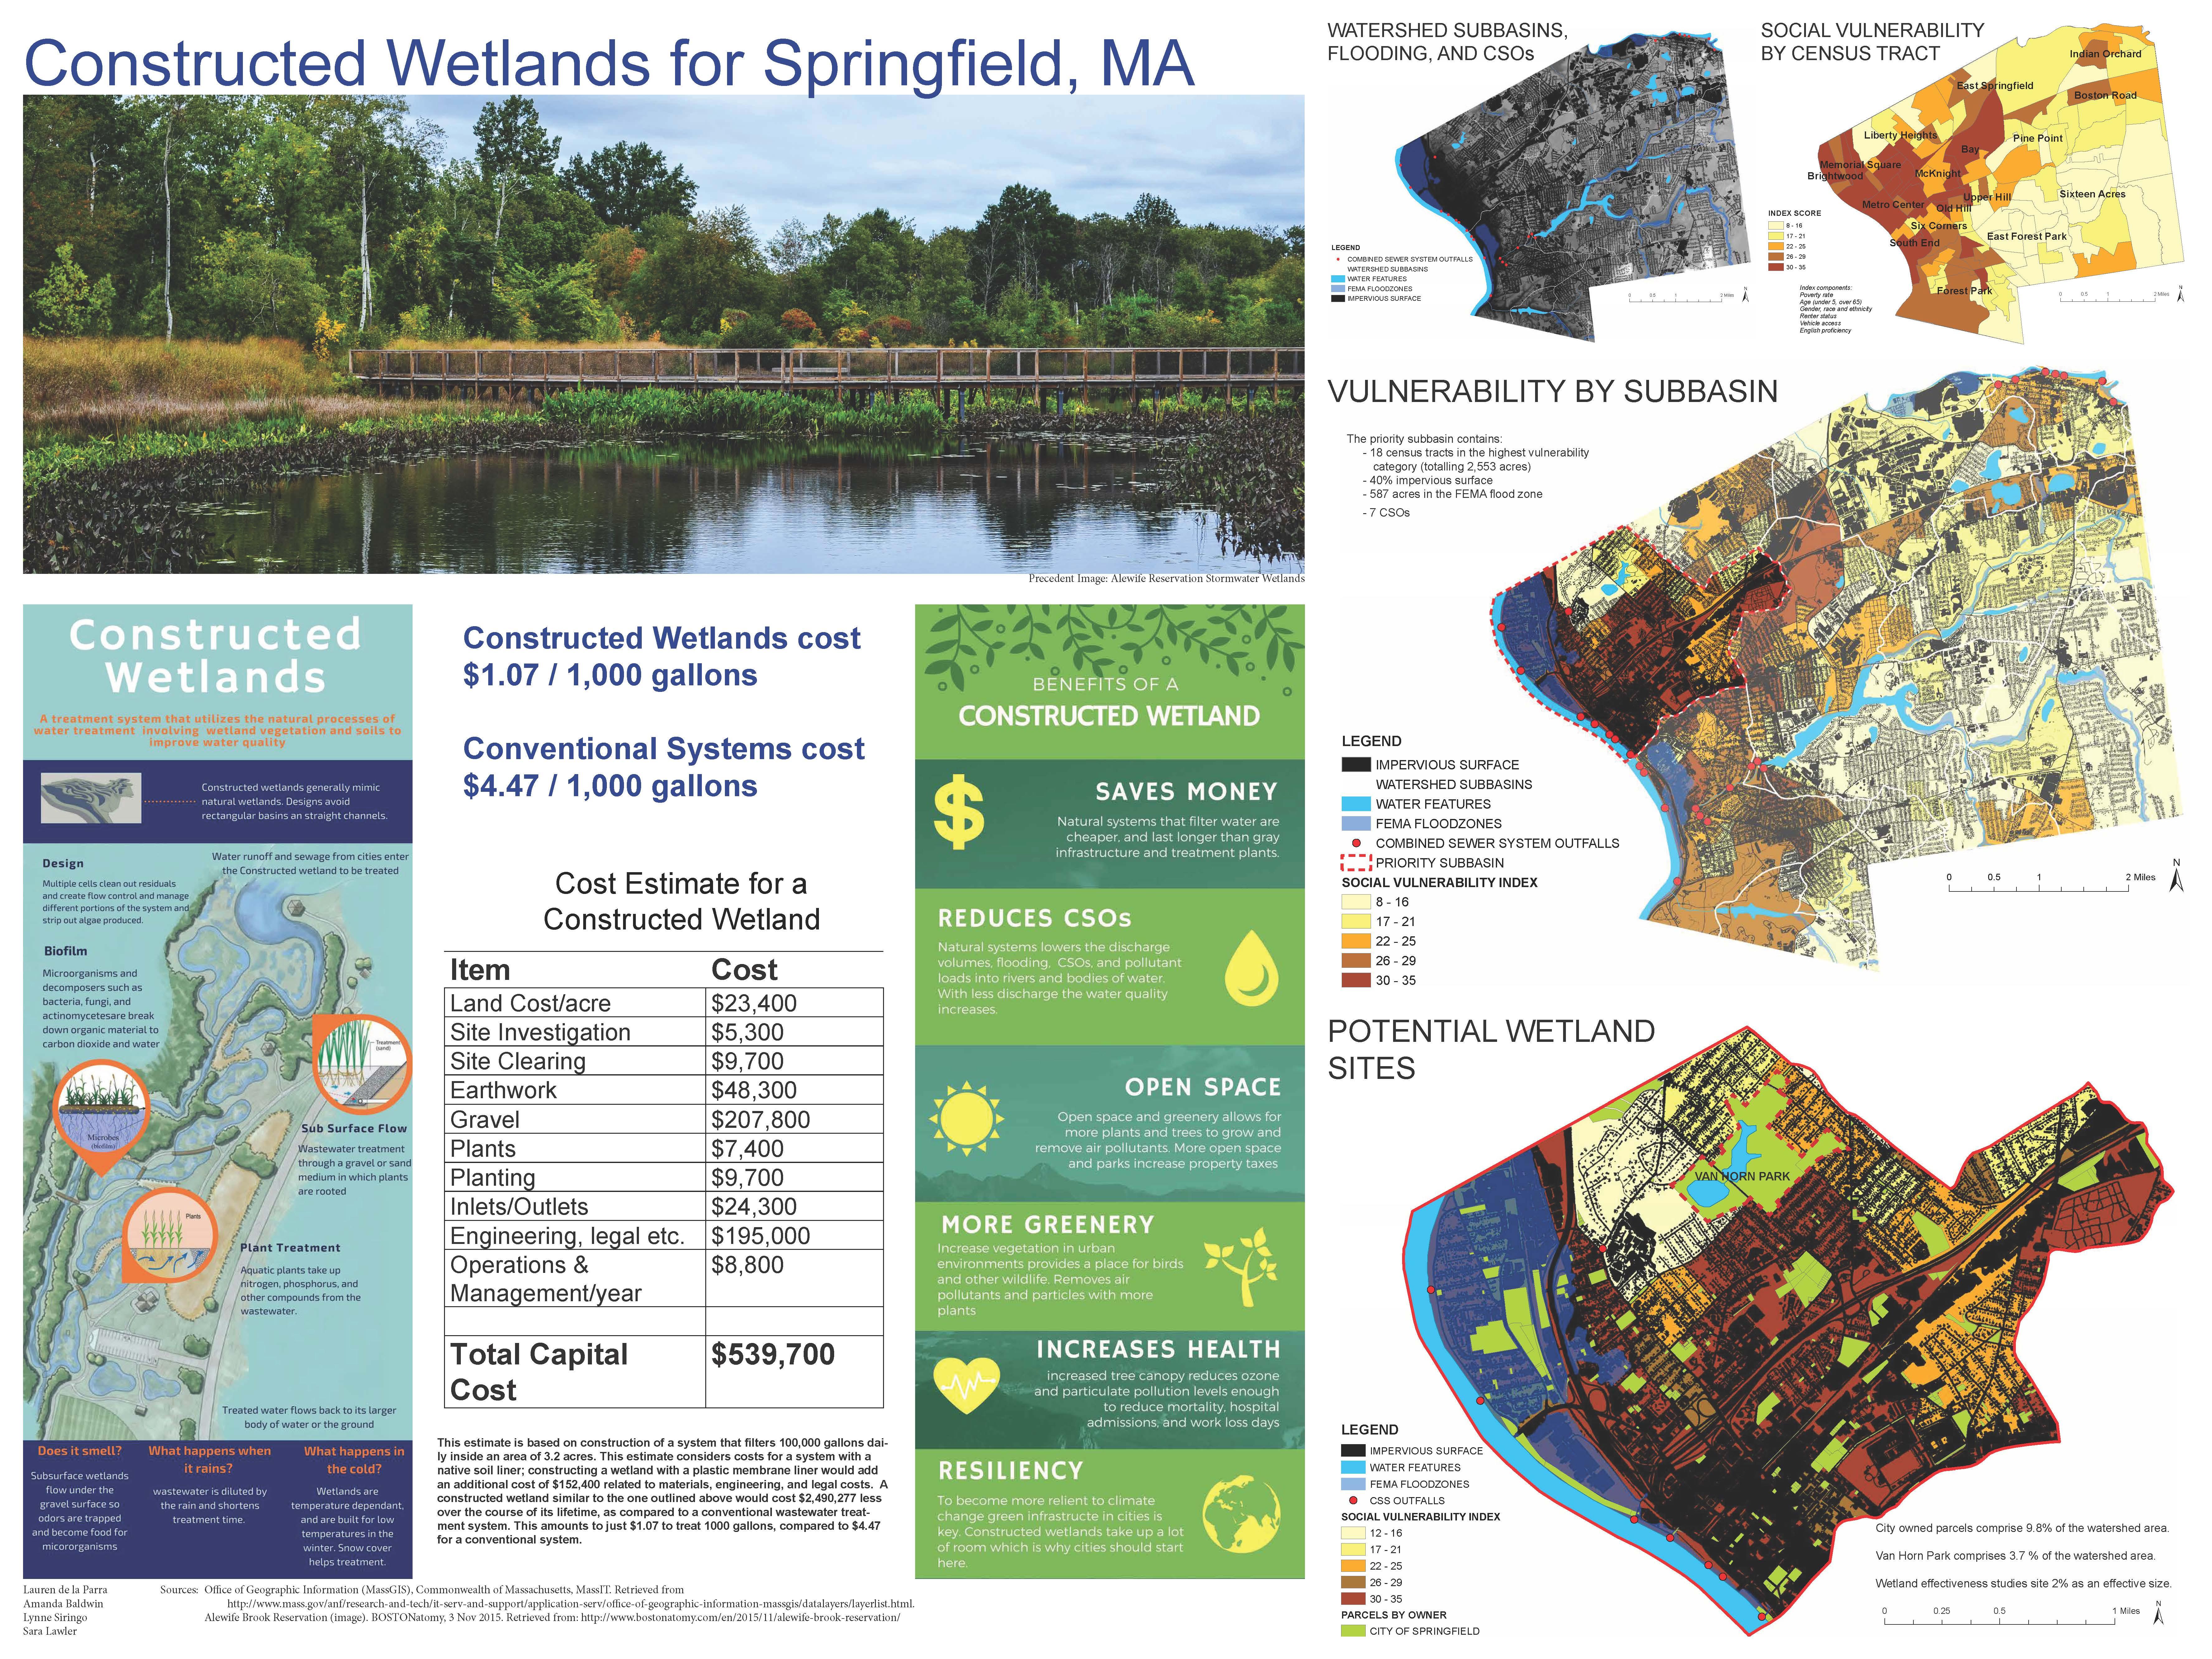 Constructed Wetlands for Springfield, MA -Lauren de la Parra, Amanda Baldwin, Lynne Siringo, Sara Lawler